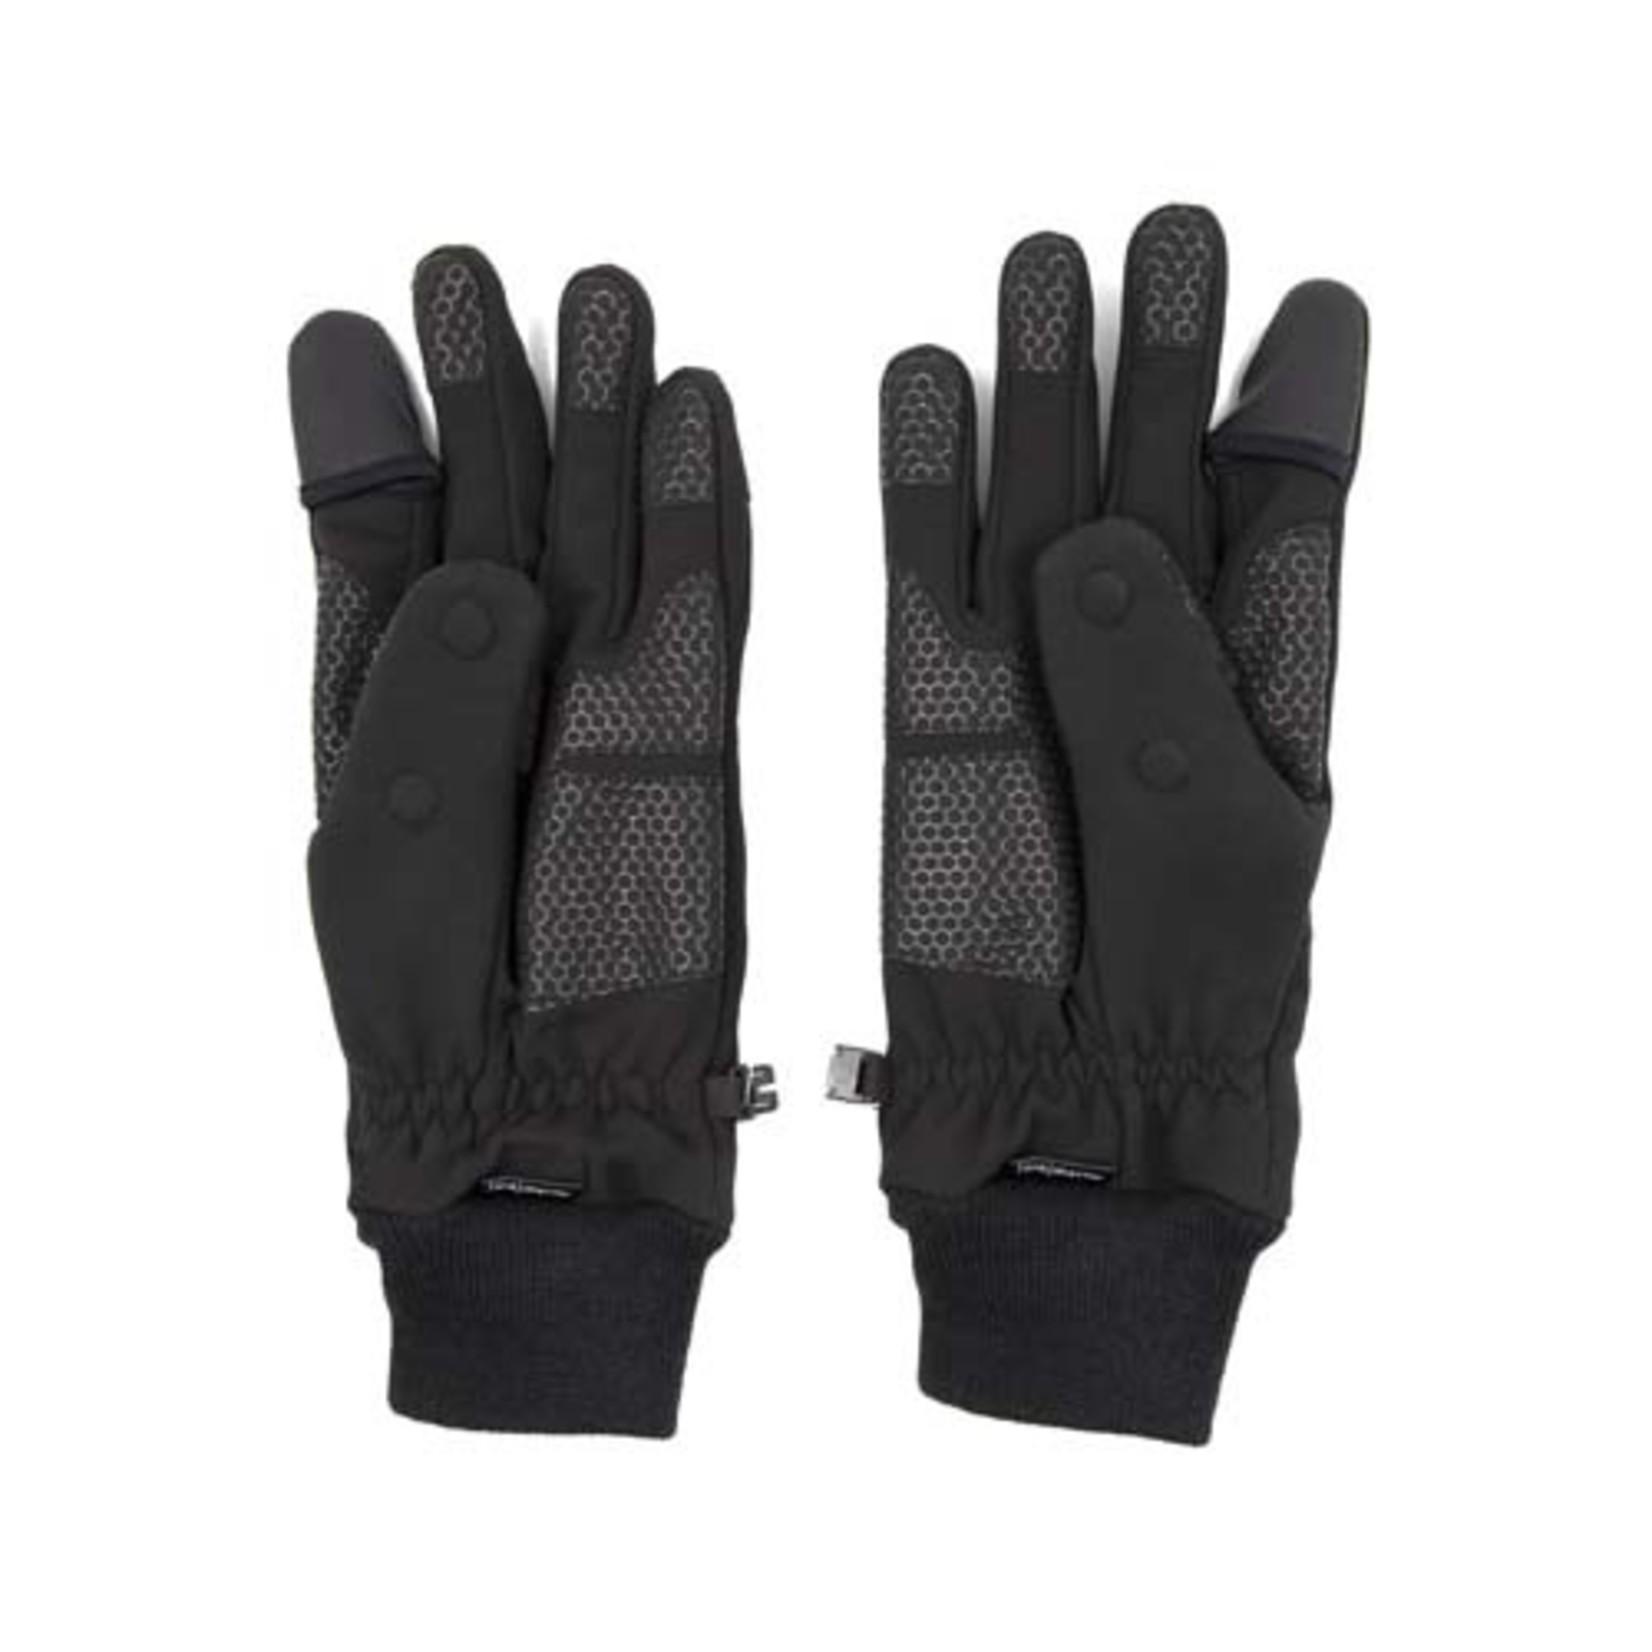 ProMaster 4-Layer Photo Gloves - XX Large v2